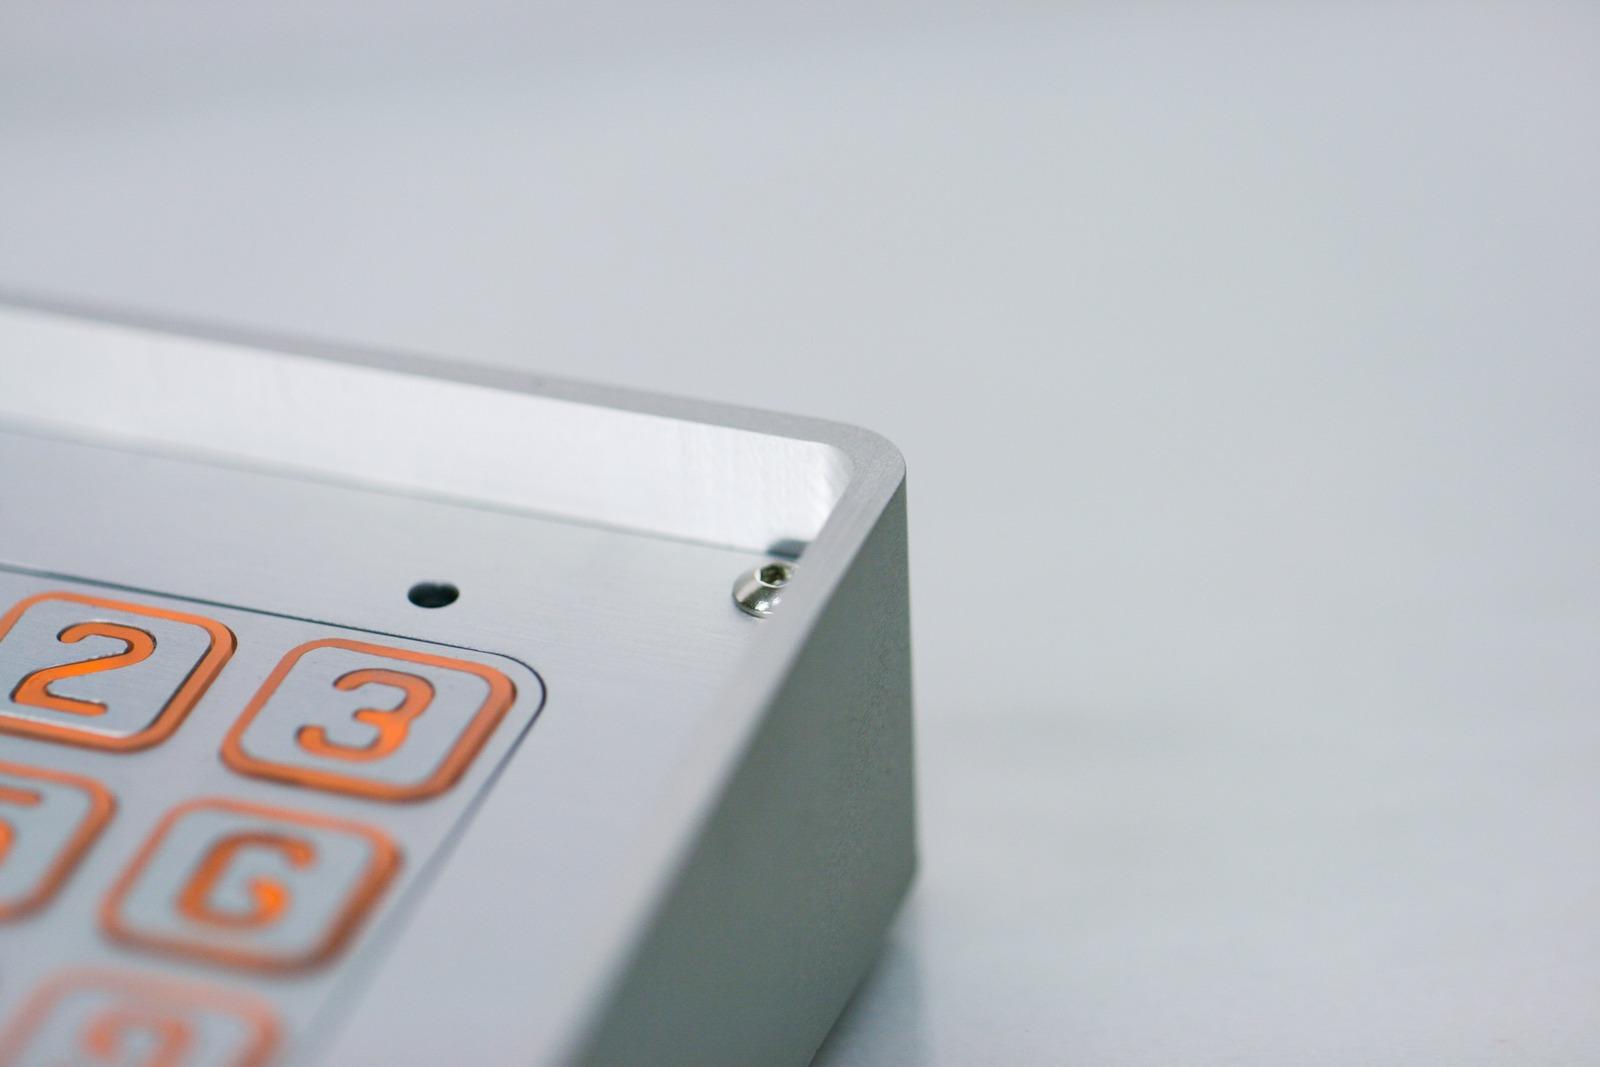 Obudowa natynkowa domofonu Radbit - stop aluminium, anodowana